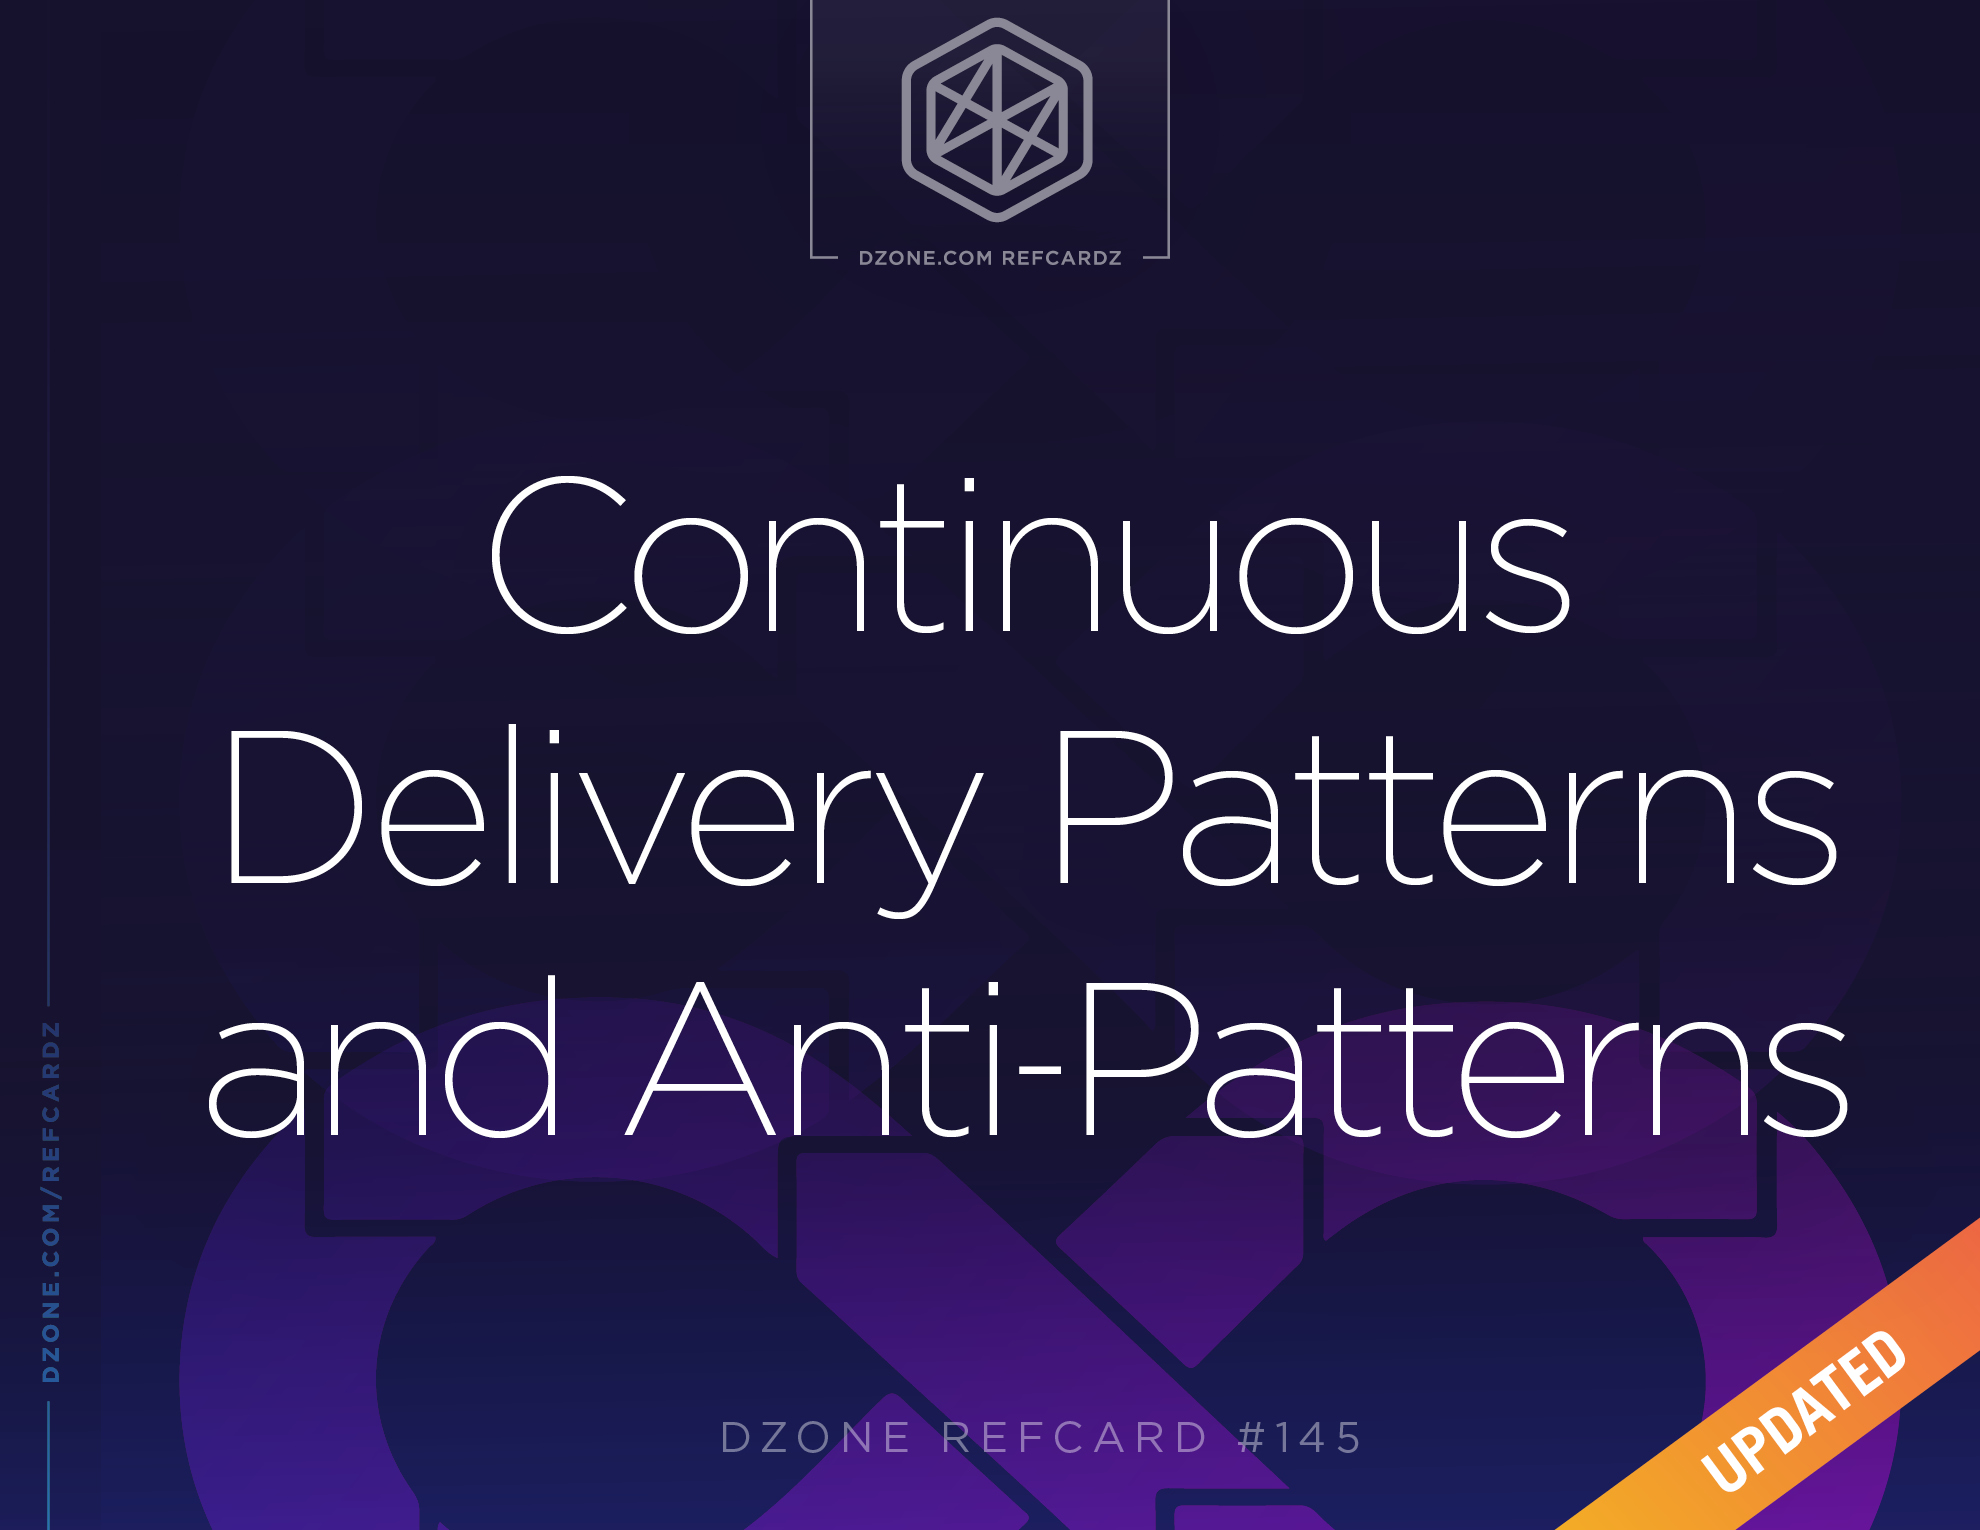 Continuous Delivery - DZone - Refcardz